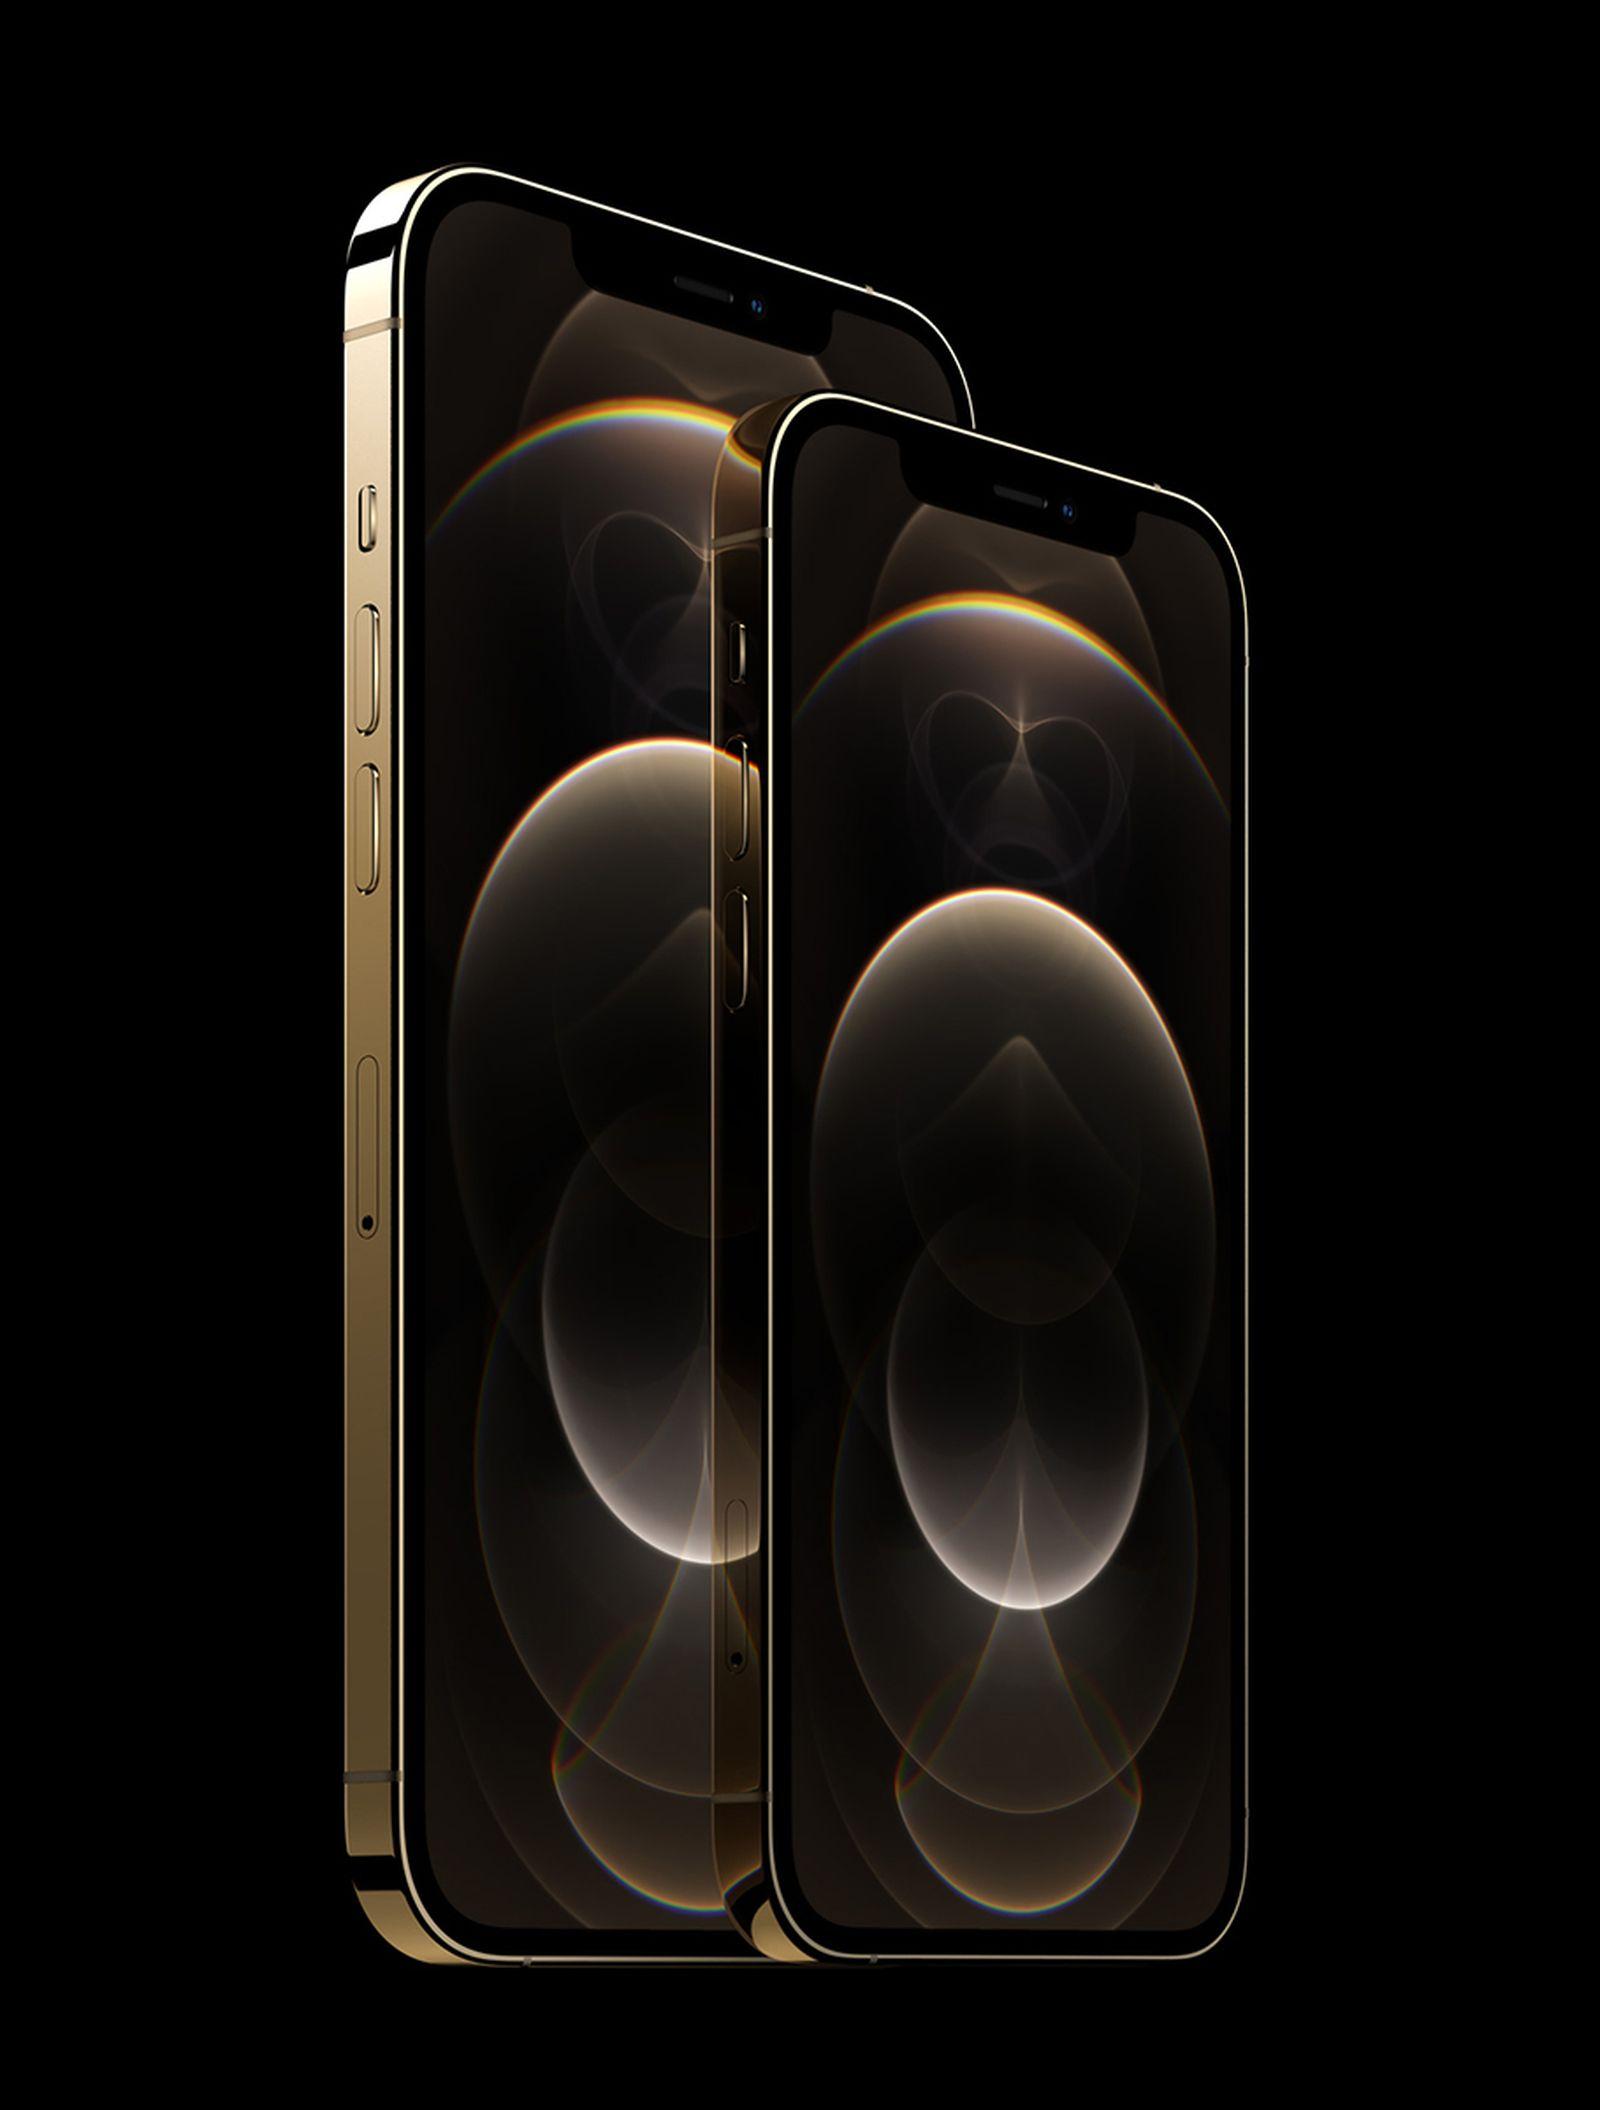 apple-iphone-12-release-date-price-1-01